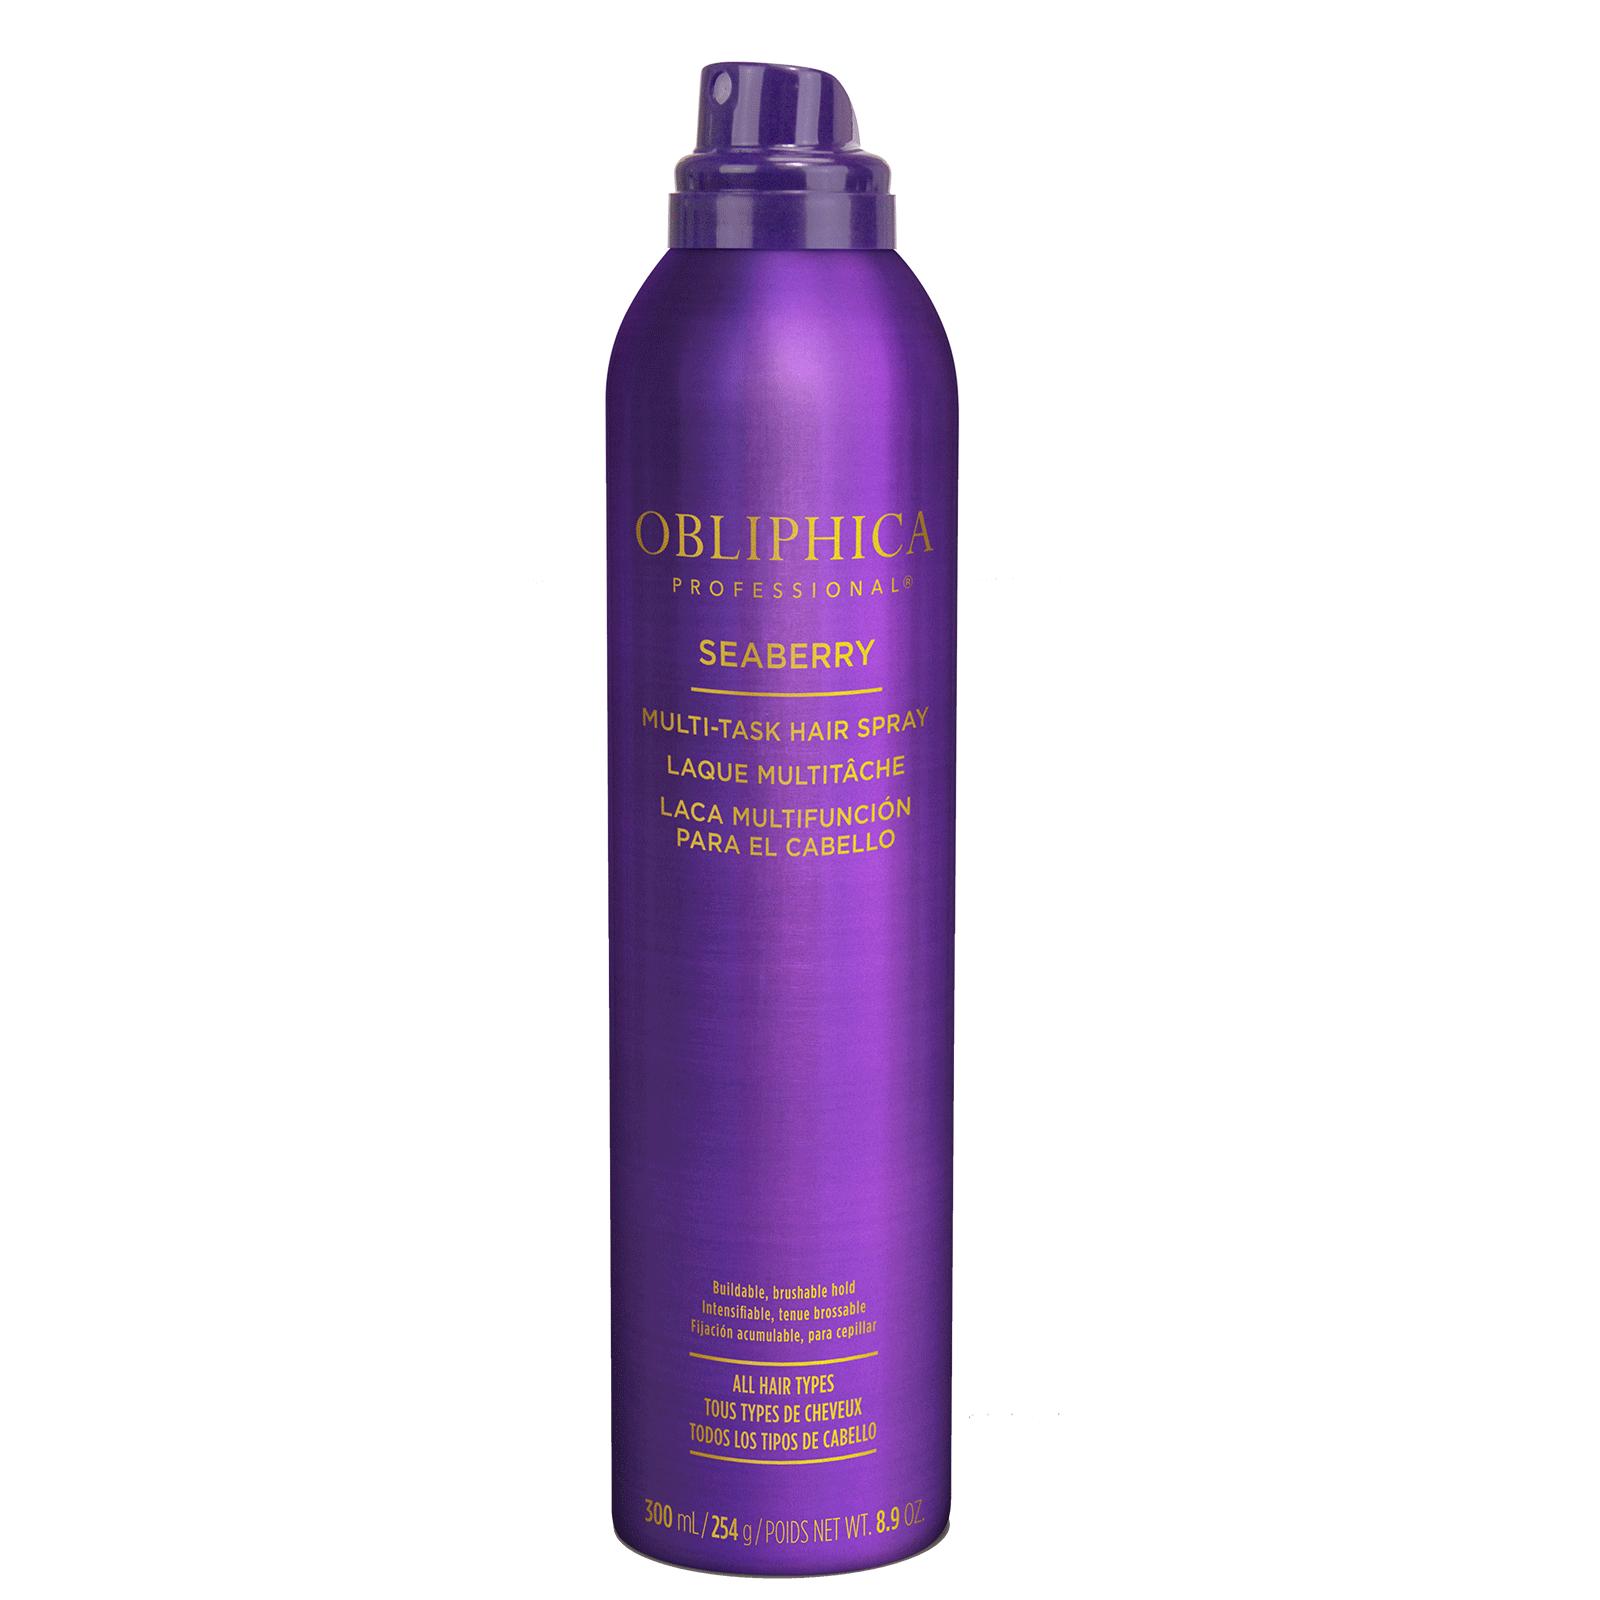 Obliphica Seaberry Multi-Task Hairspray 8.9oz